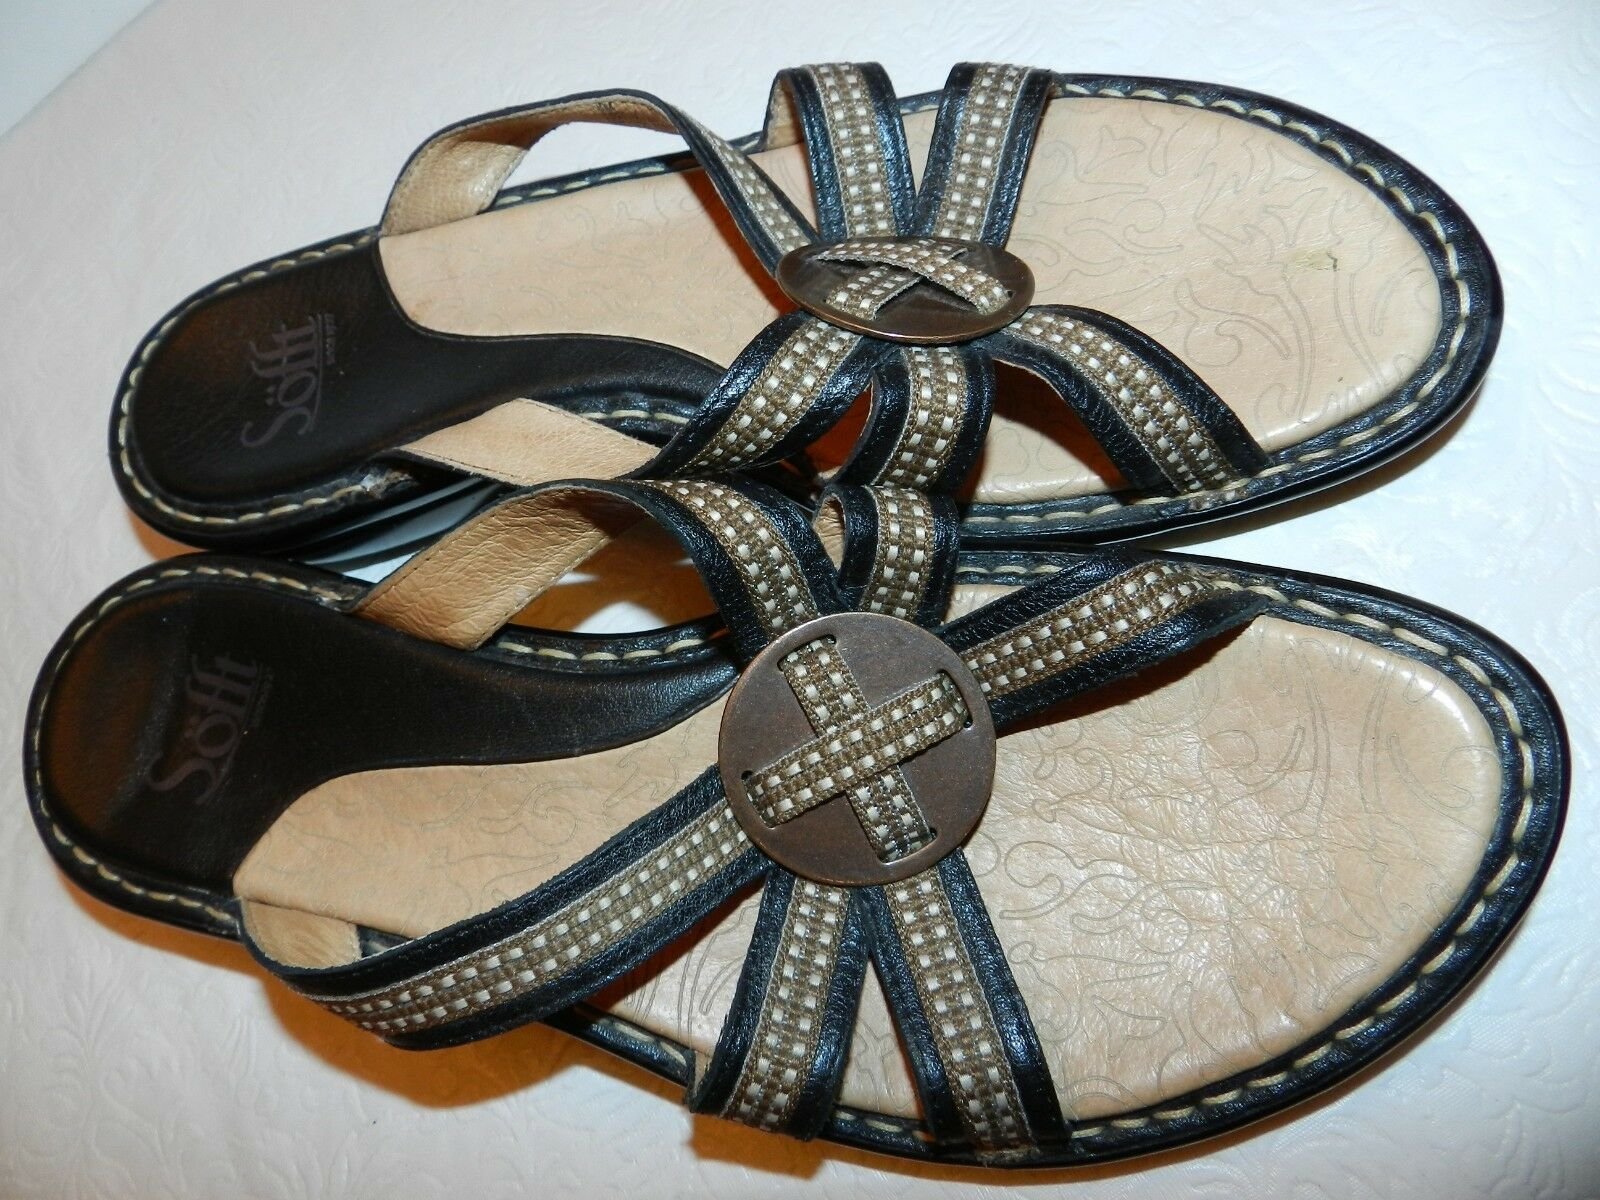 Pleaser US Womens Seduce-205 Ankle-Strap Sandal,Black Patent,8 M US Pleaser e18faa